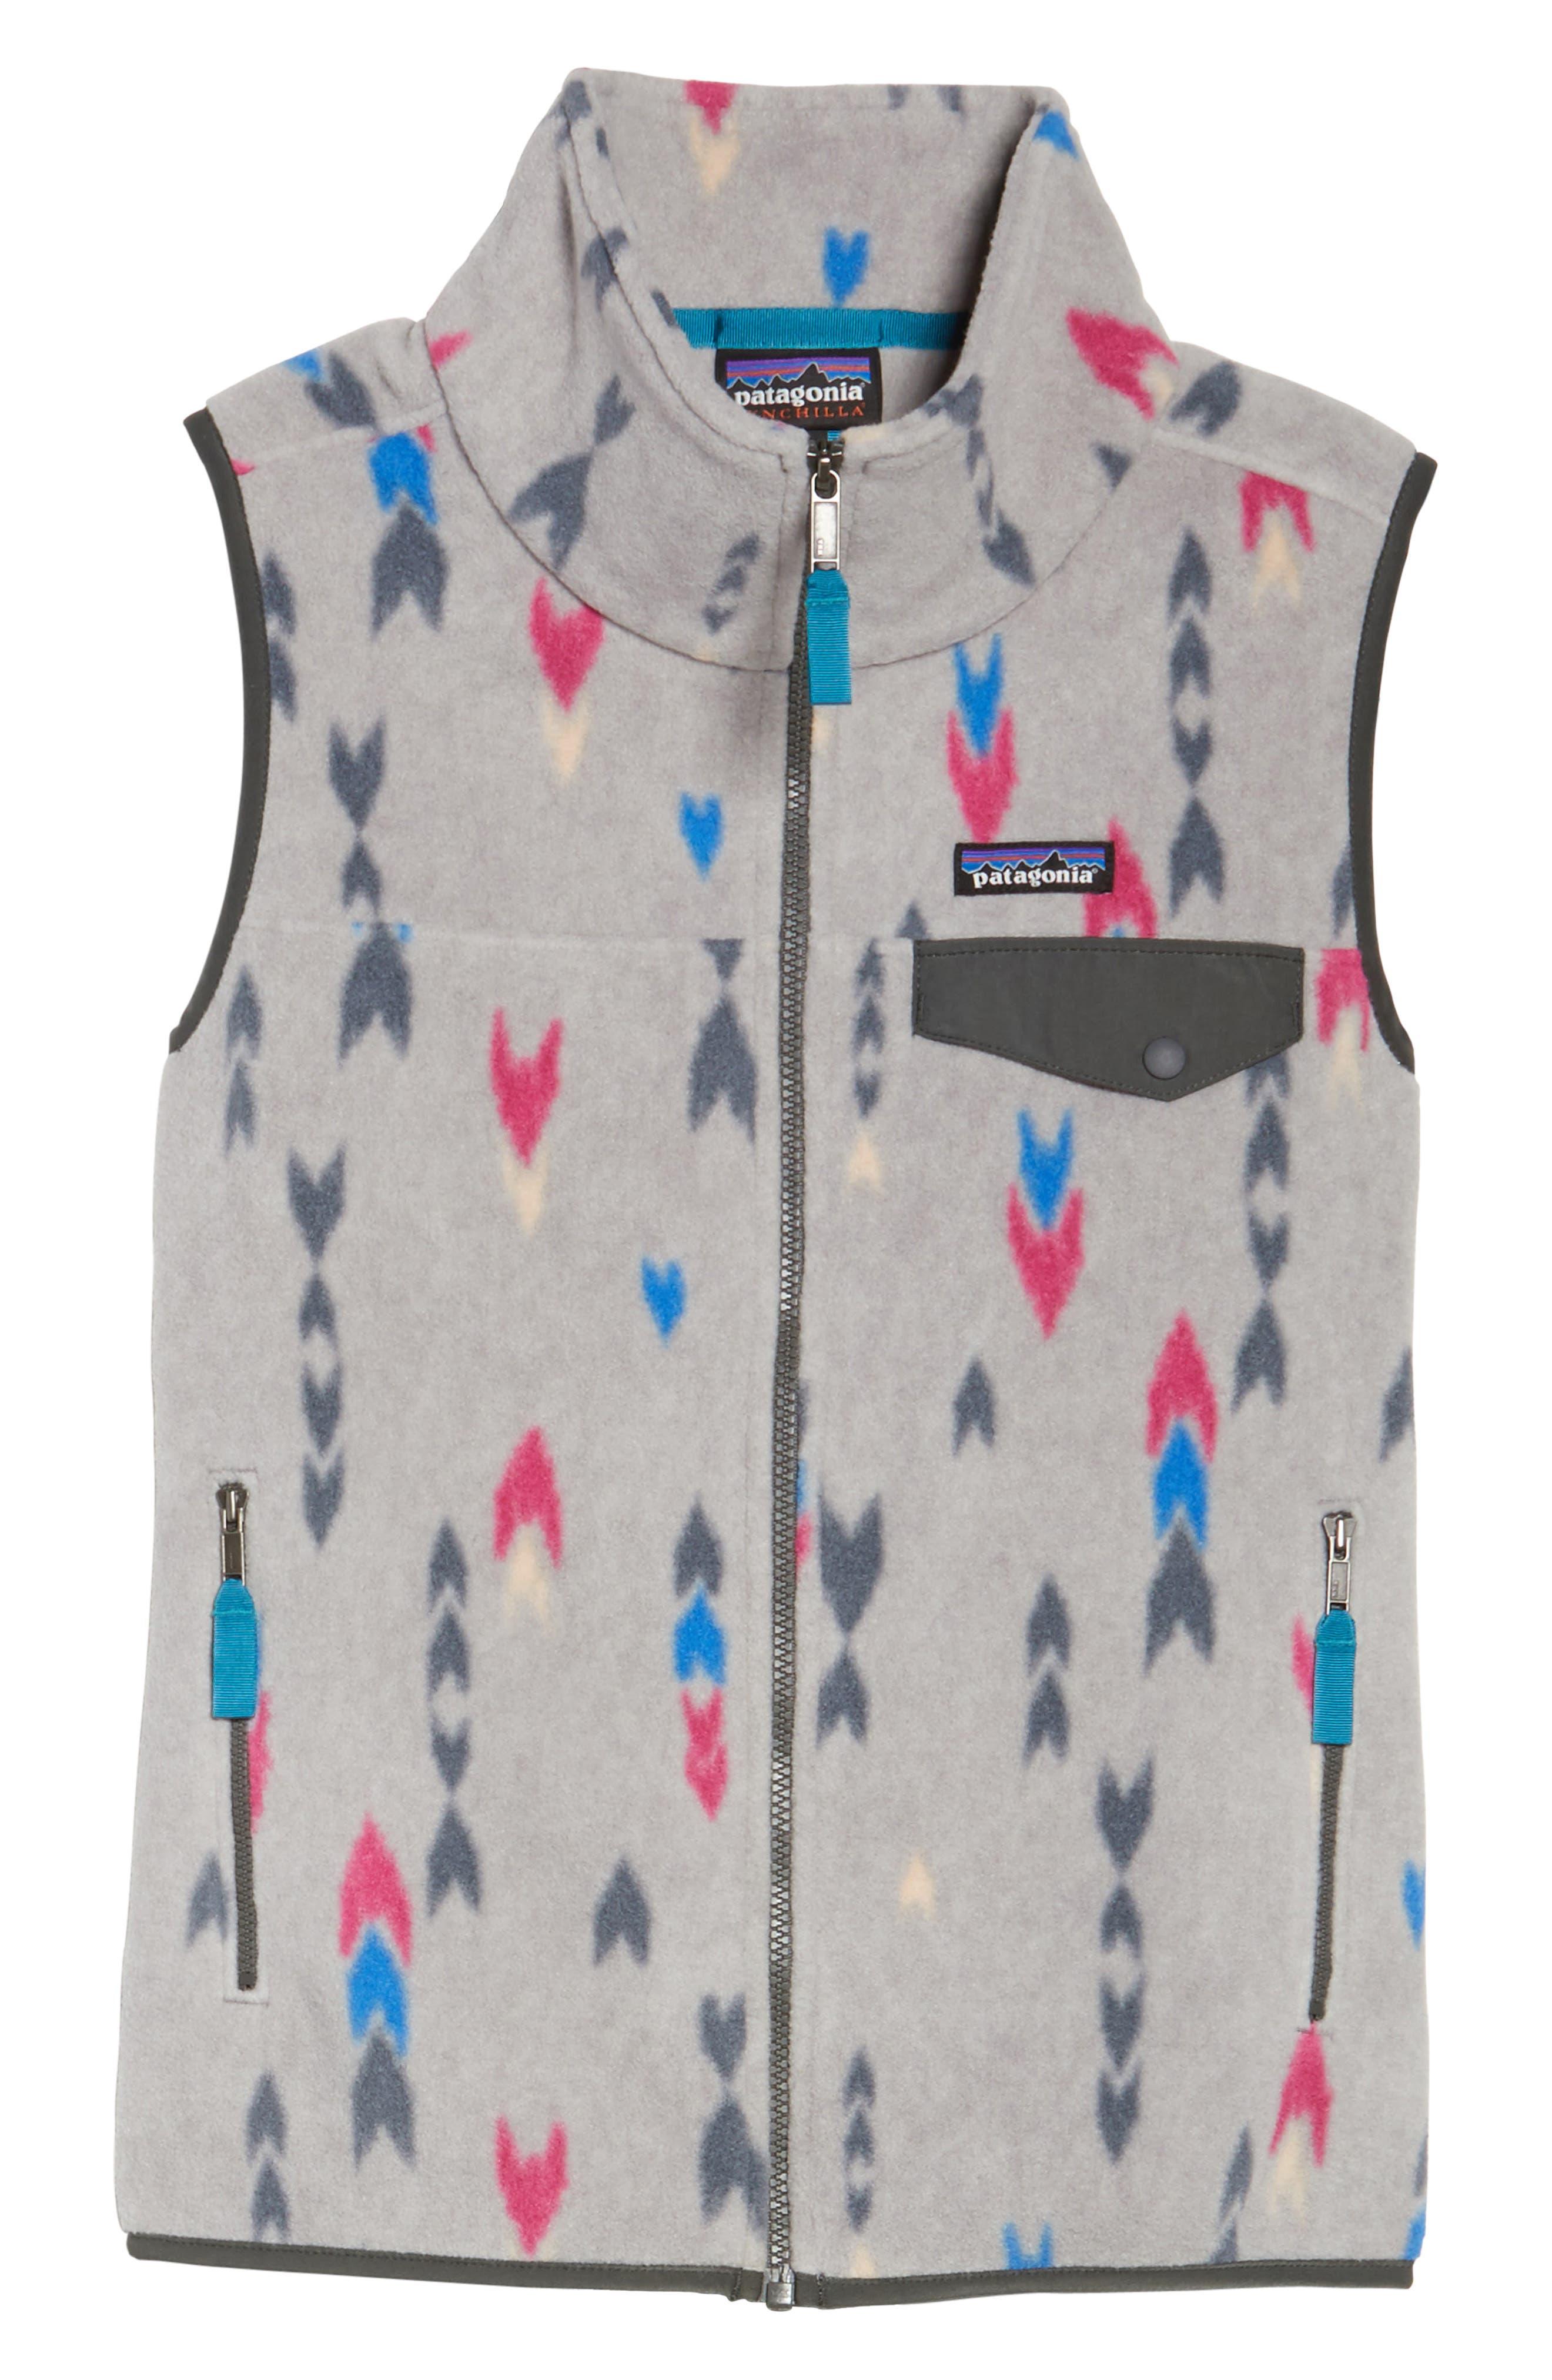 Snap-T<sup>®</sup> Fleece Vest,                         Main,                         color, Wish Tails Big/ Craft Pink